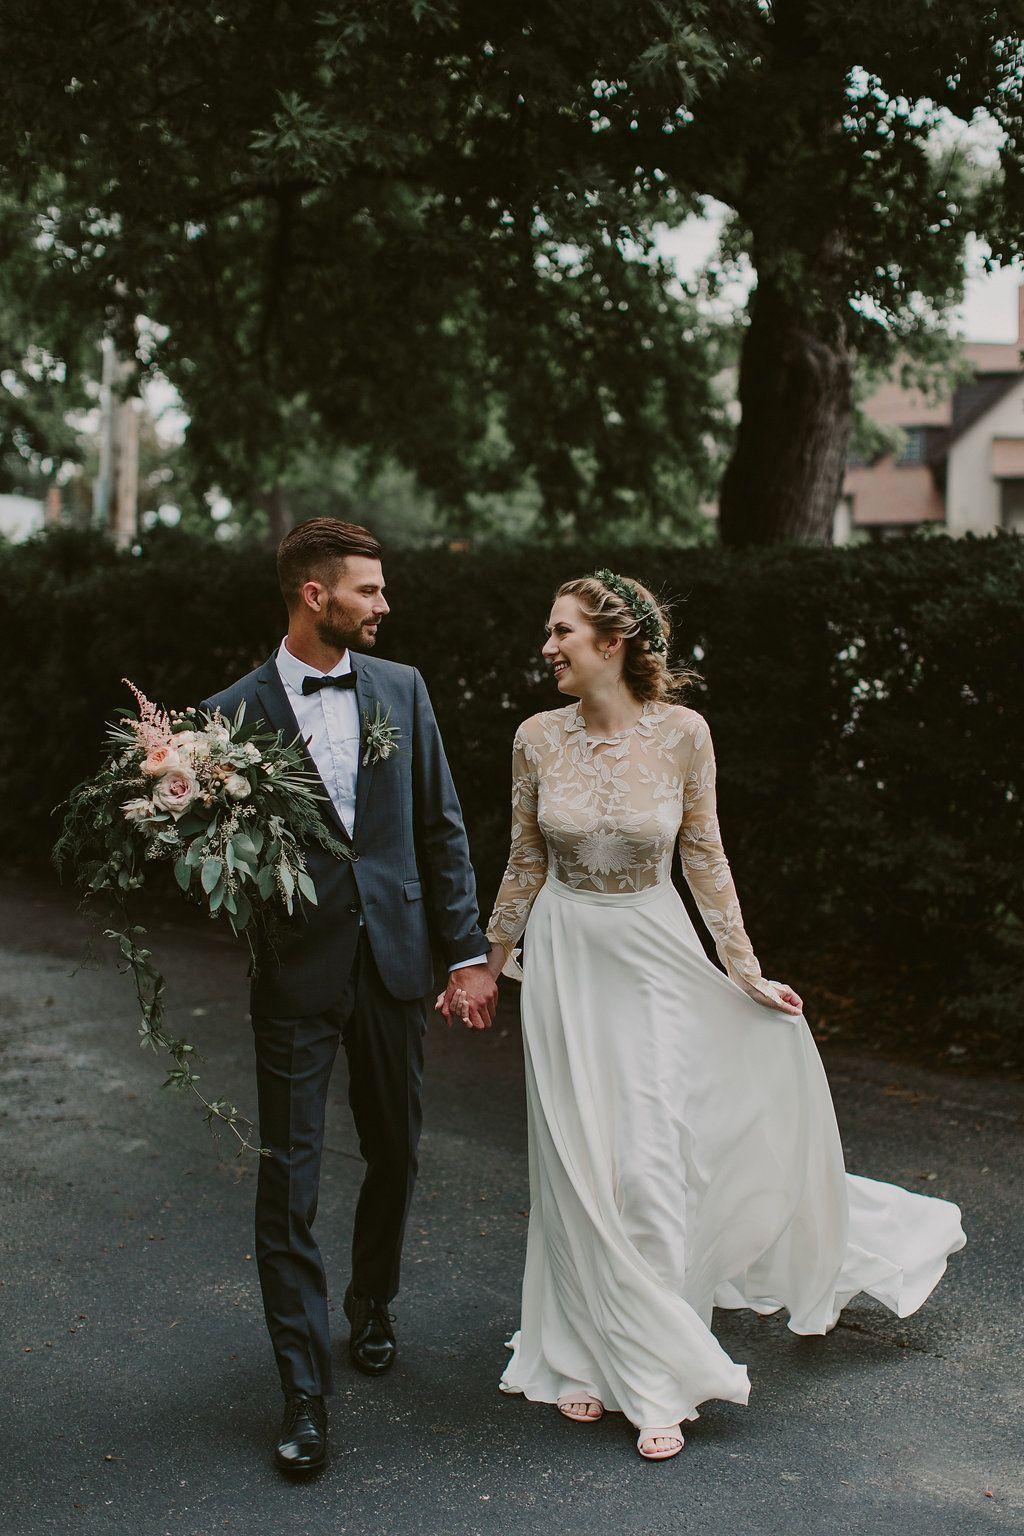 Canadian wedding with greenery galore photo by brandon scott